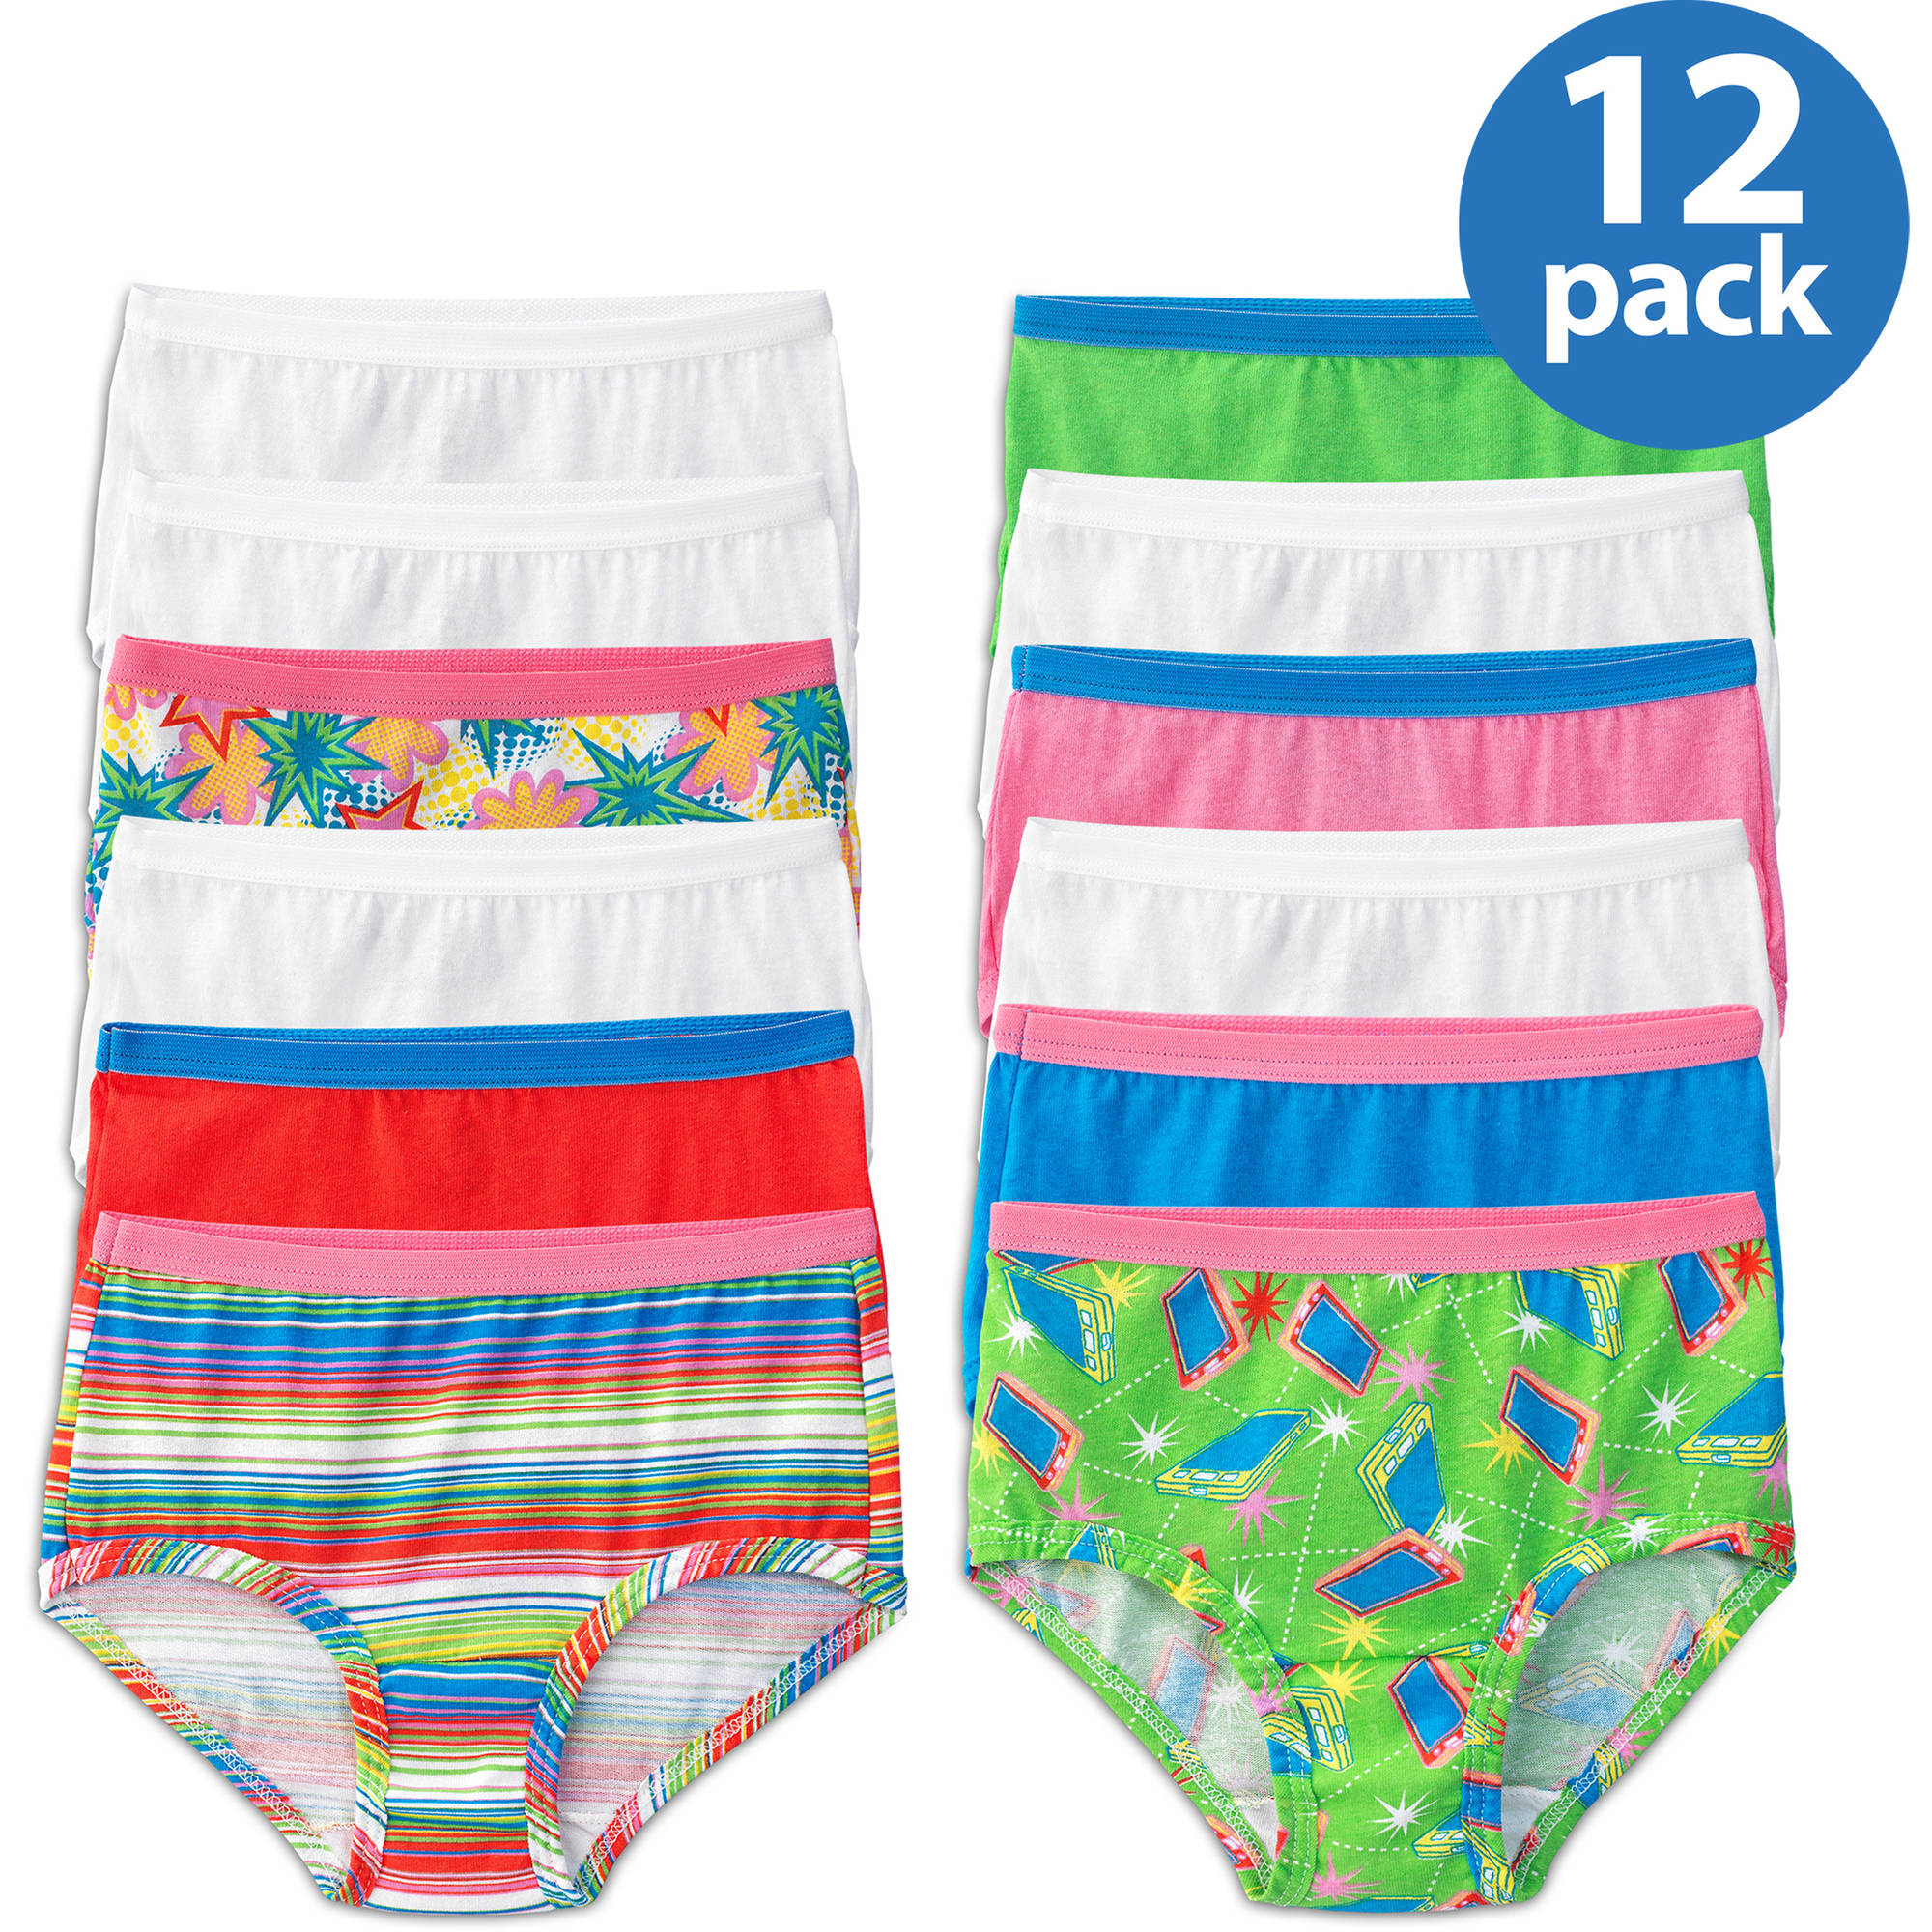 Fruit of the Loom Girls' 100% Cotton Brief Panties, 12-Pack